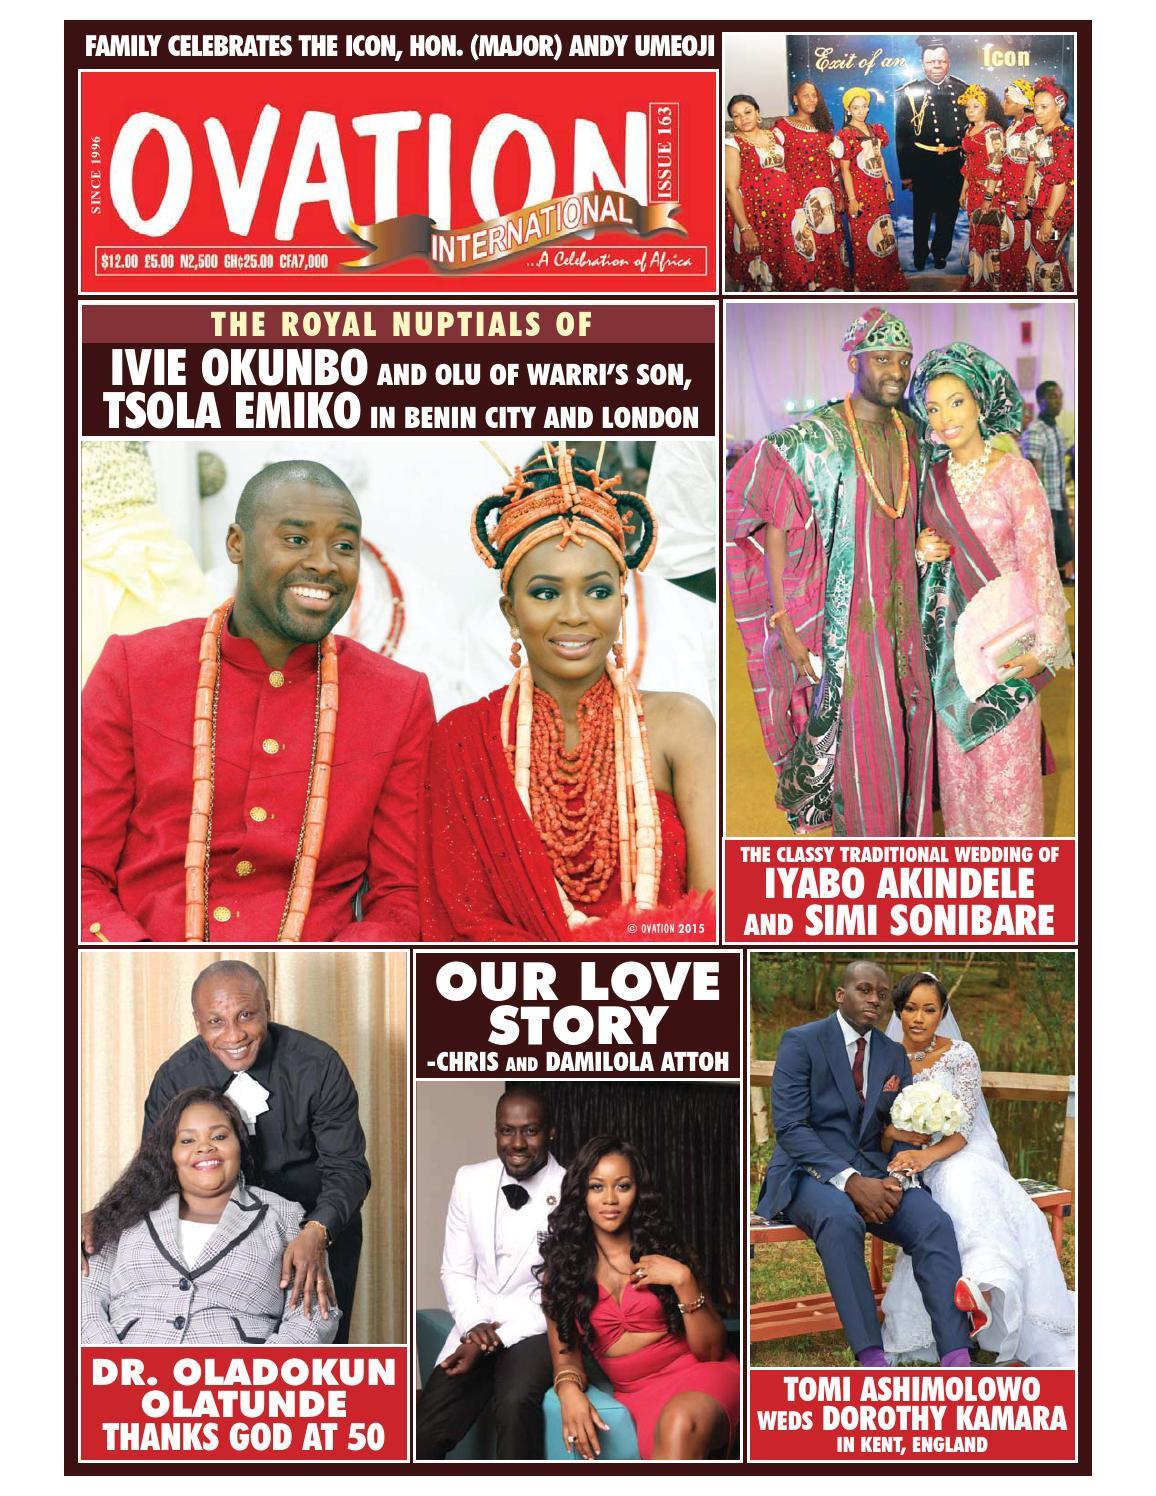 Ovation magazine issue 163 by t2eOvation - issuu